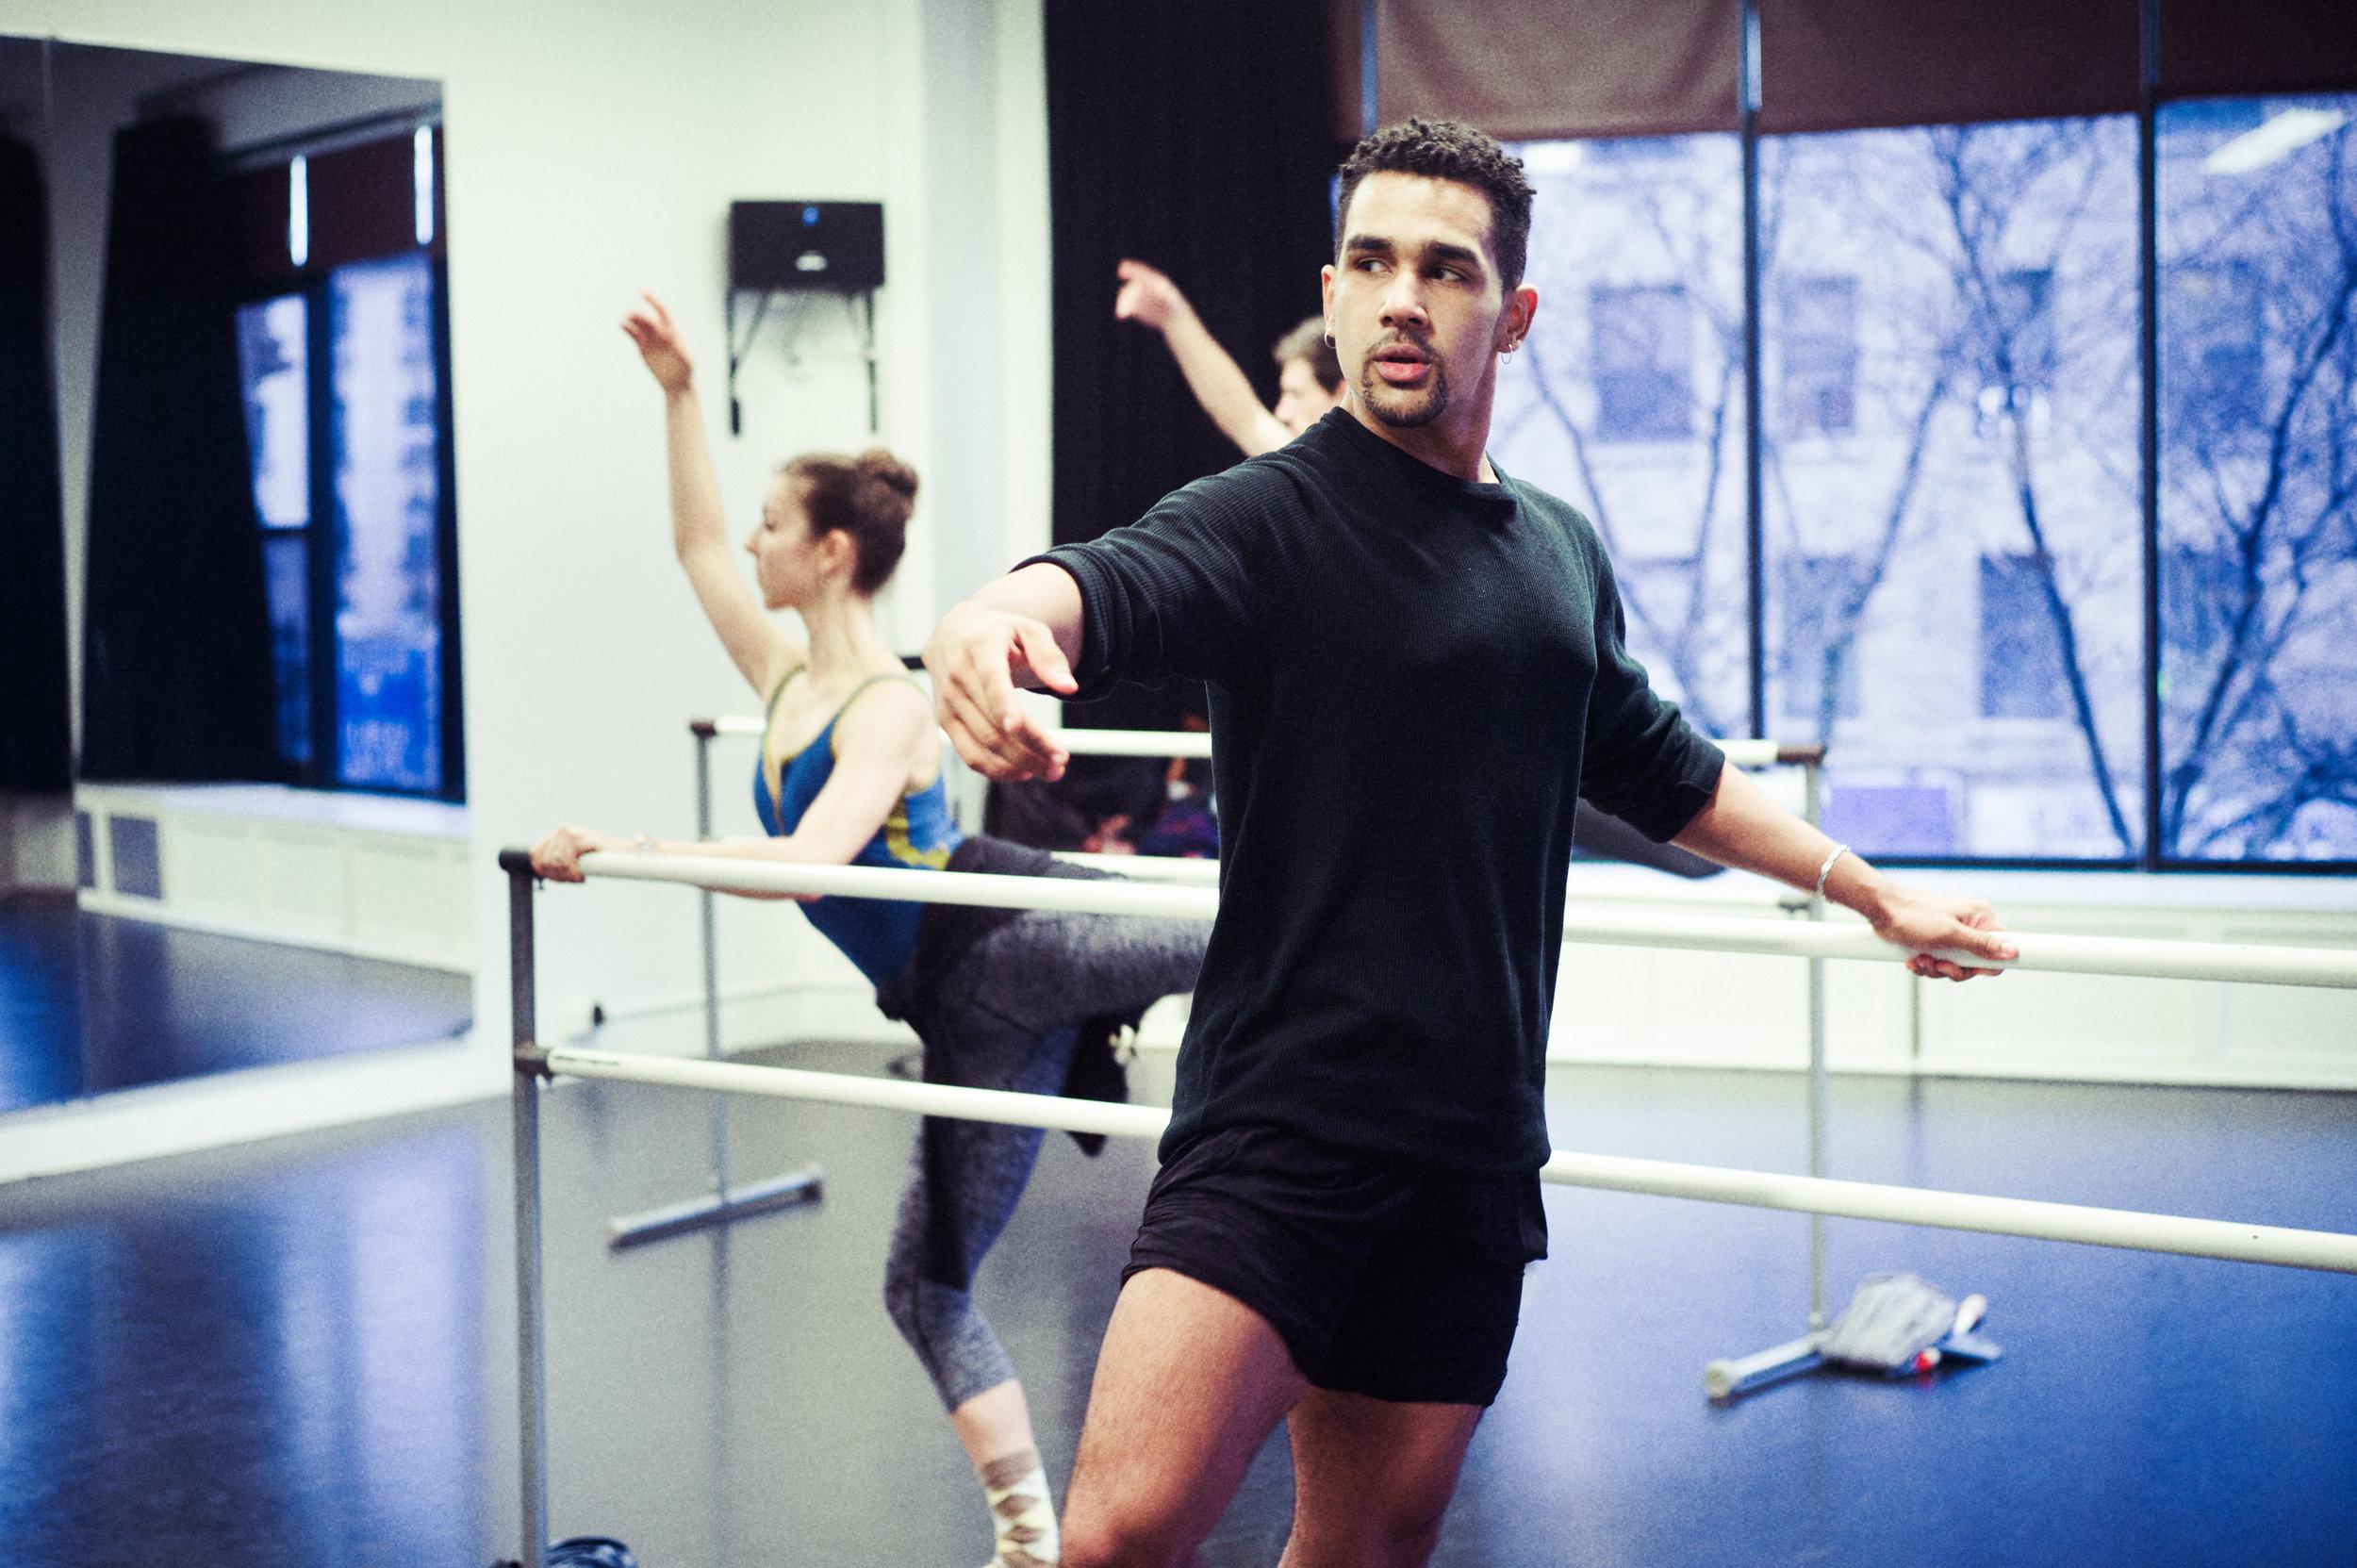 ioulex-dpwh-adult-ballet-2126822.jpg